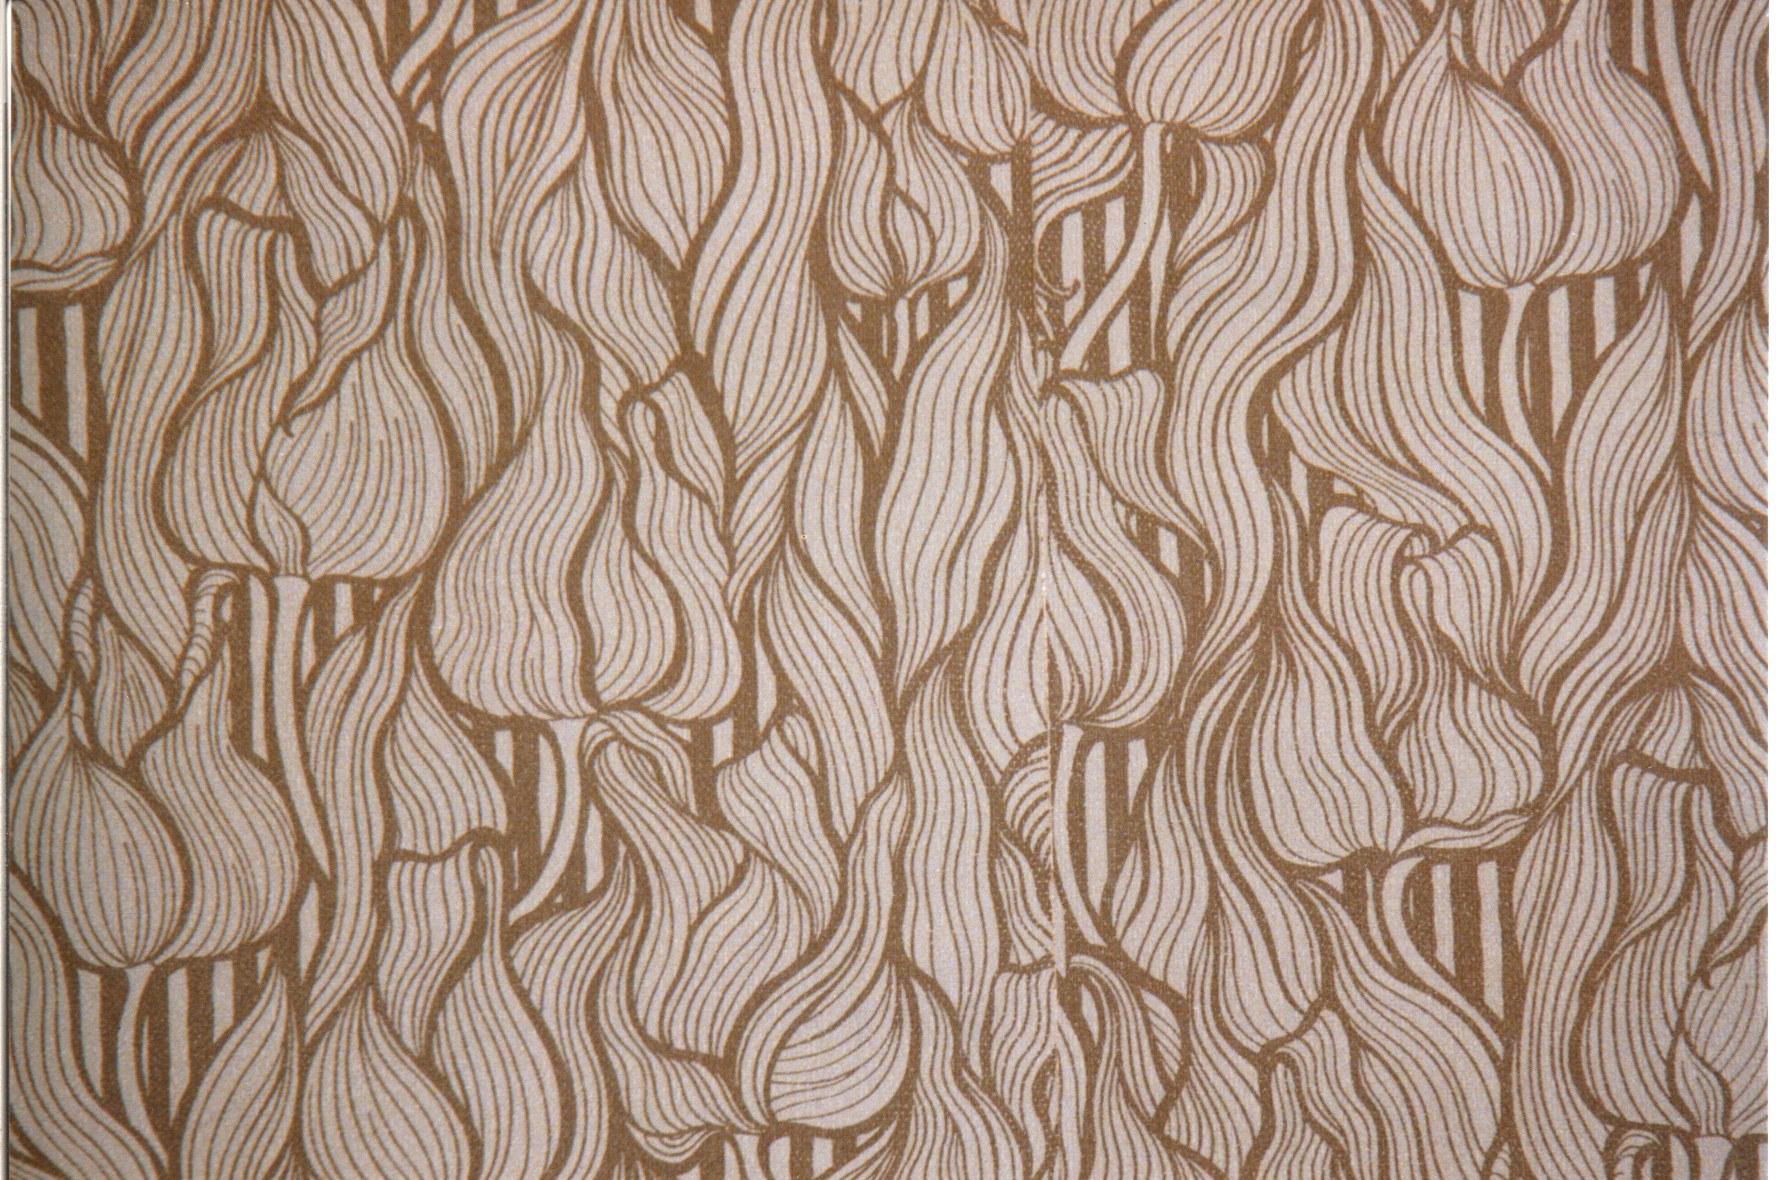 textured wallpaper for walls 2015   Grasscloth Wallpaper 1776x1180